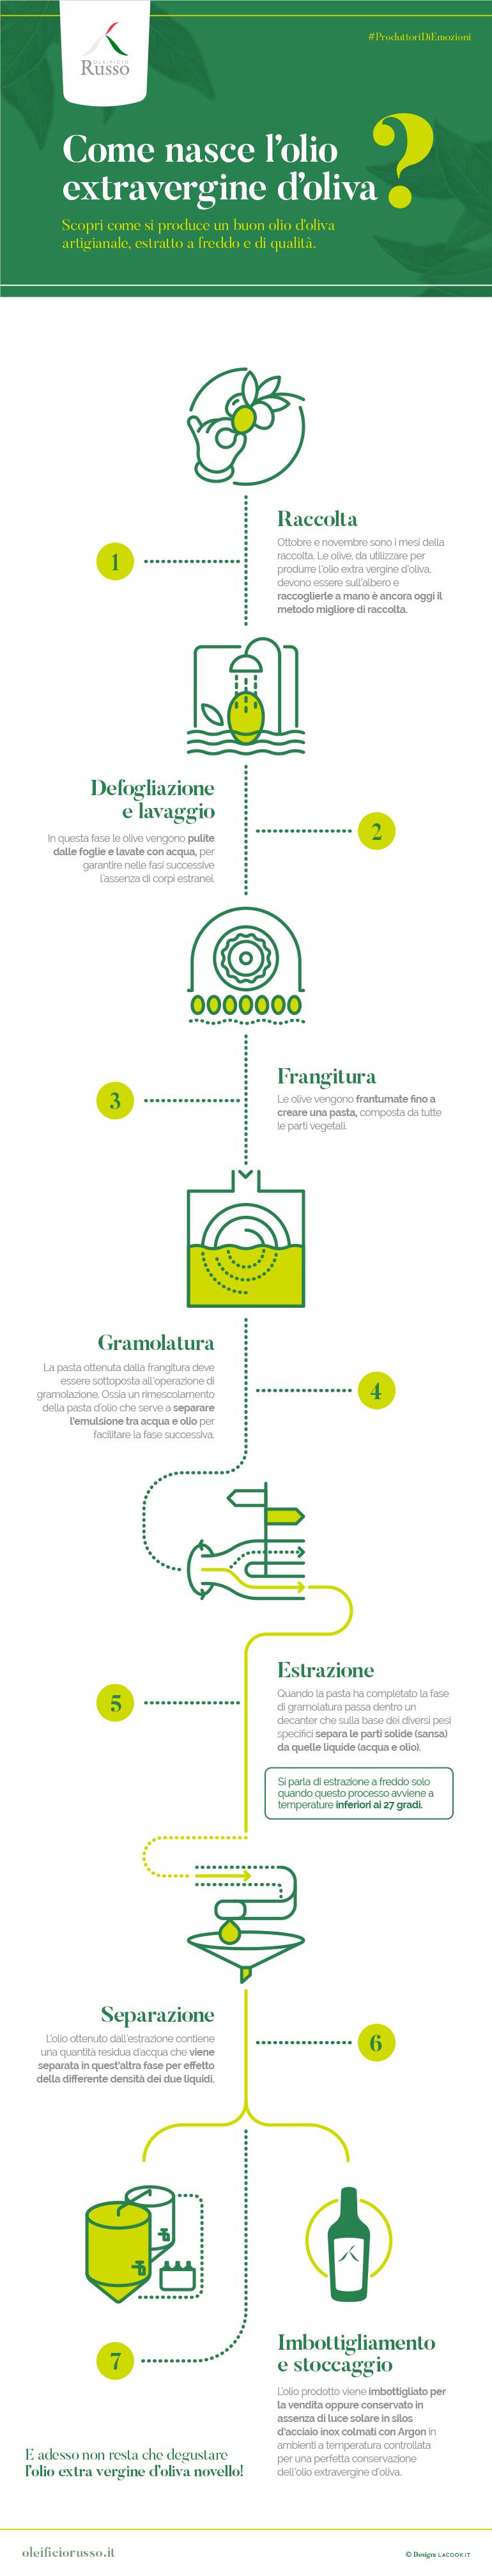 Come si produce l'olio extra vergine d'oliva